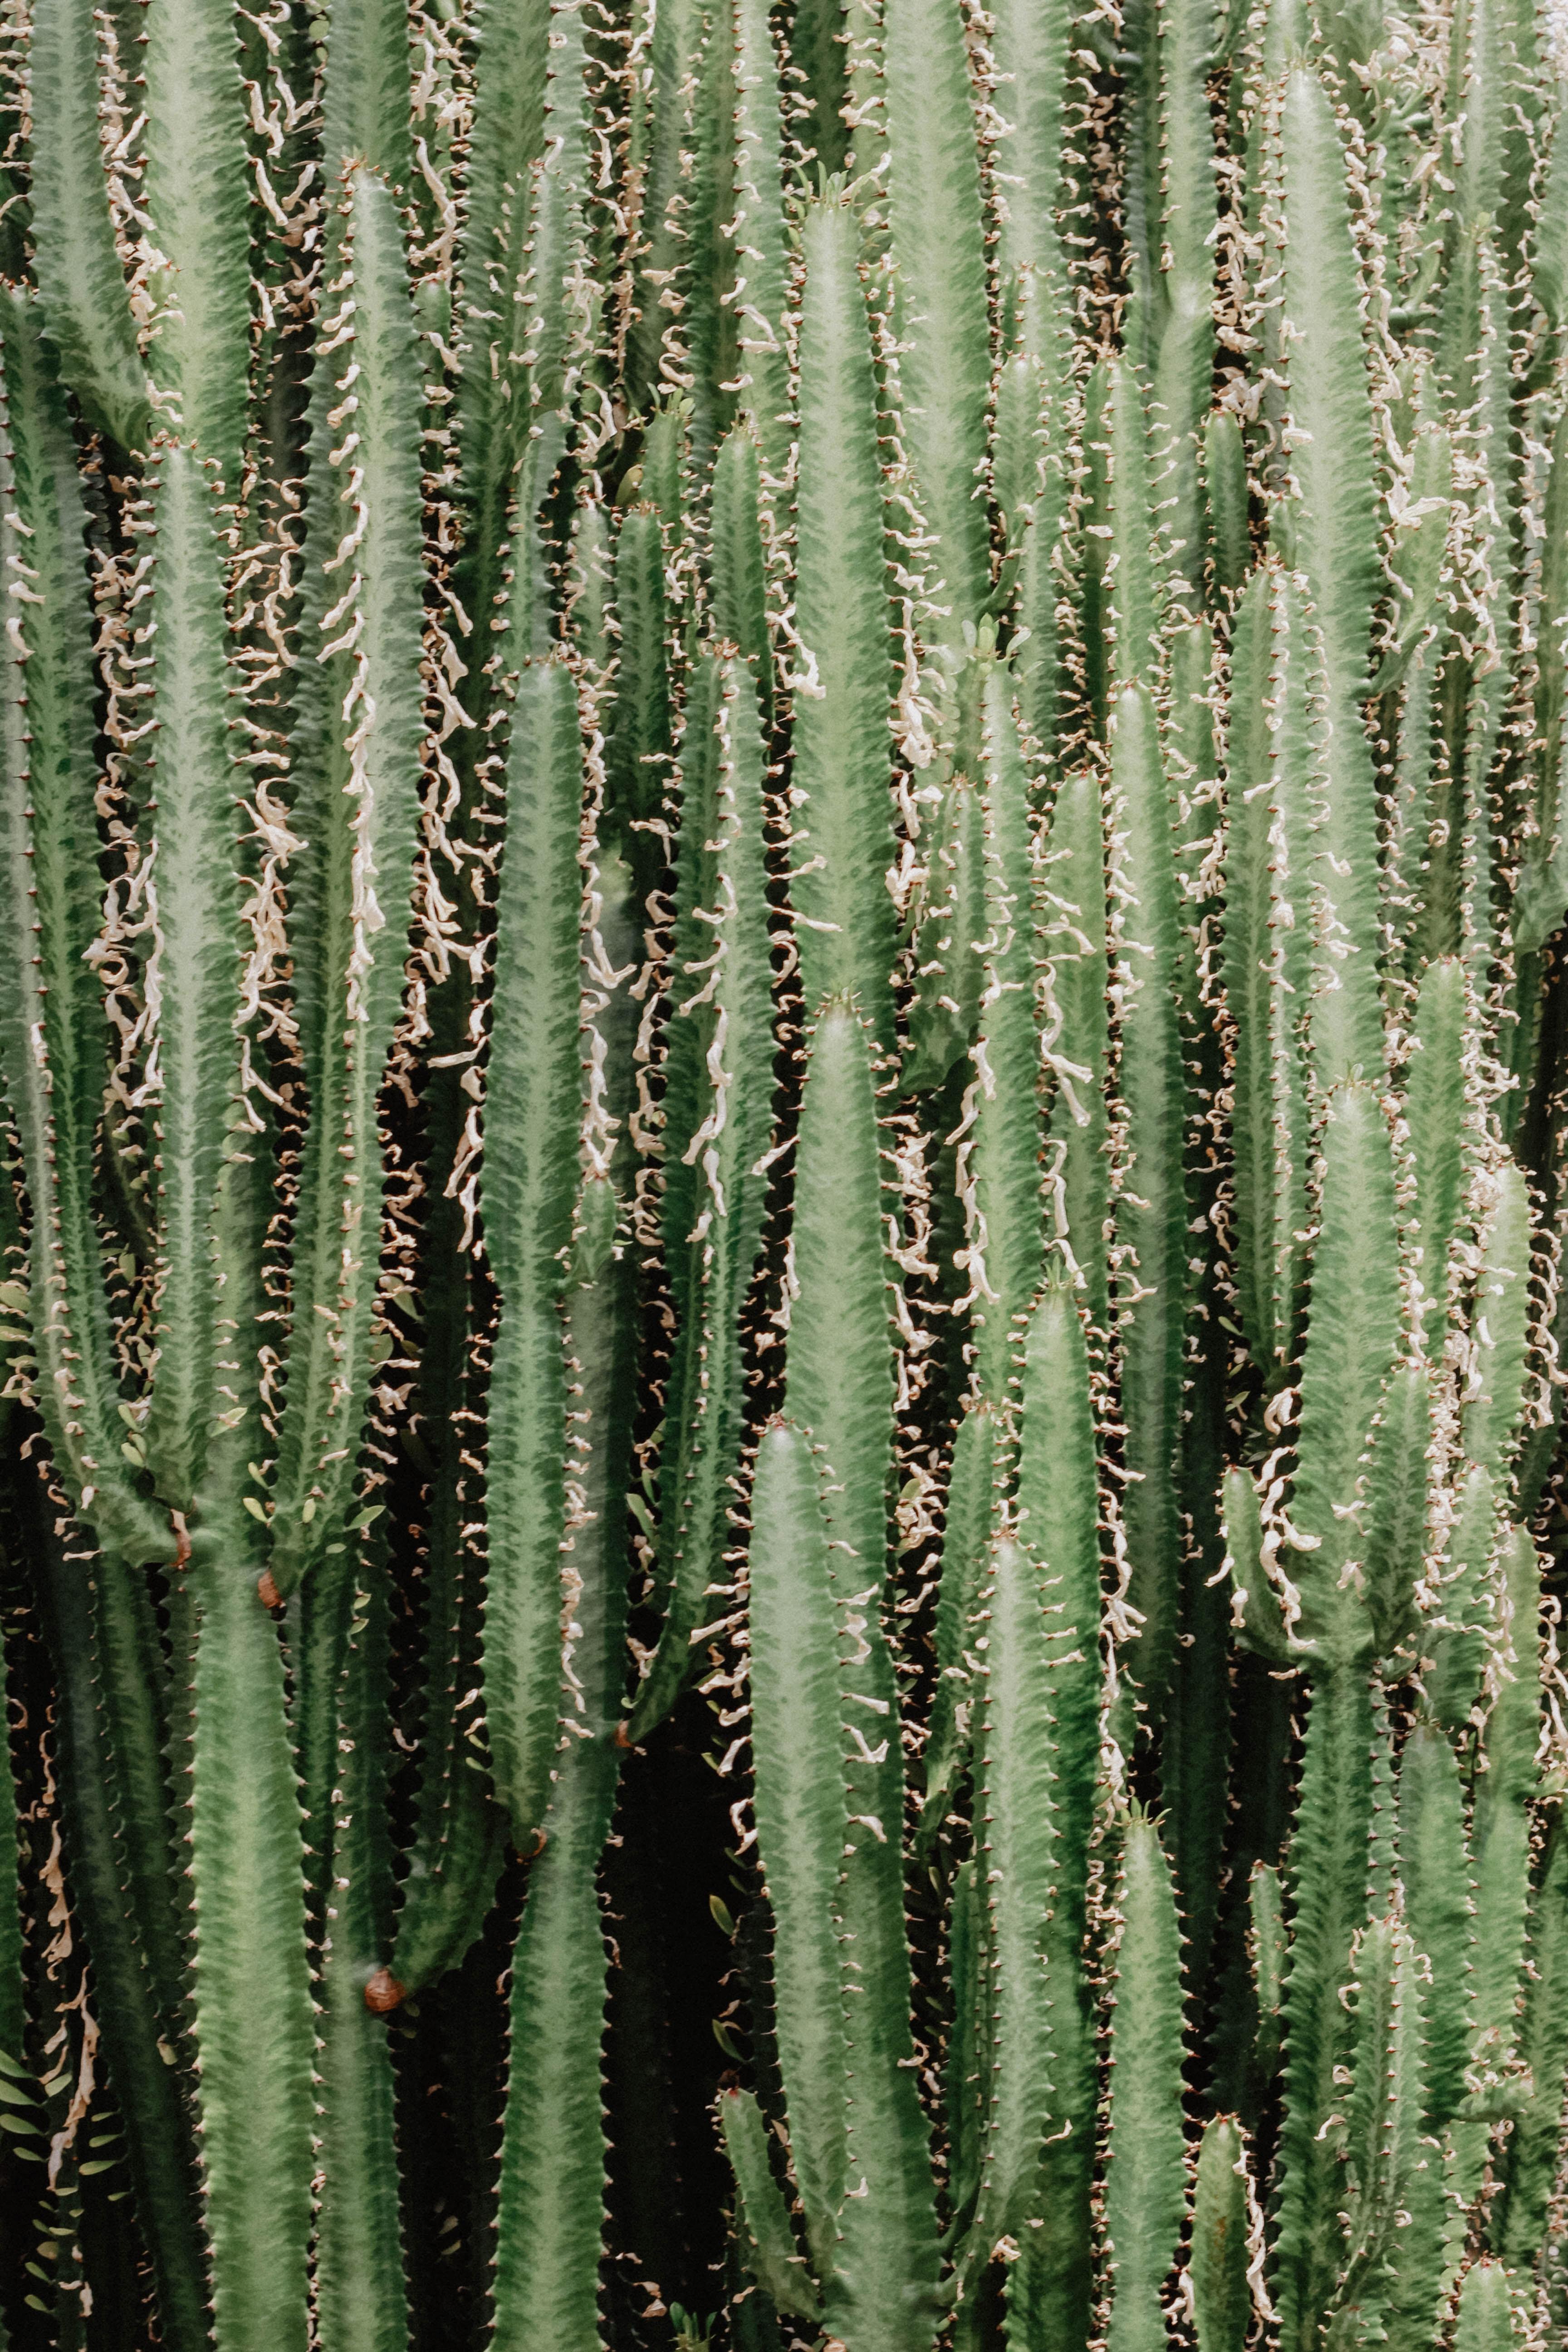 green cactus plant close-up photo